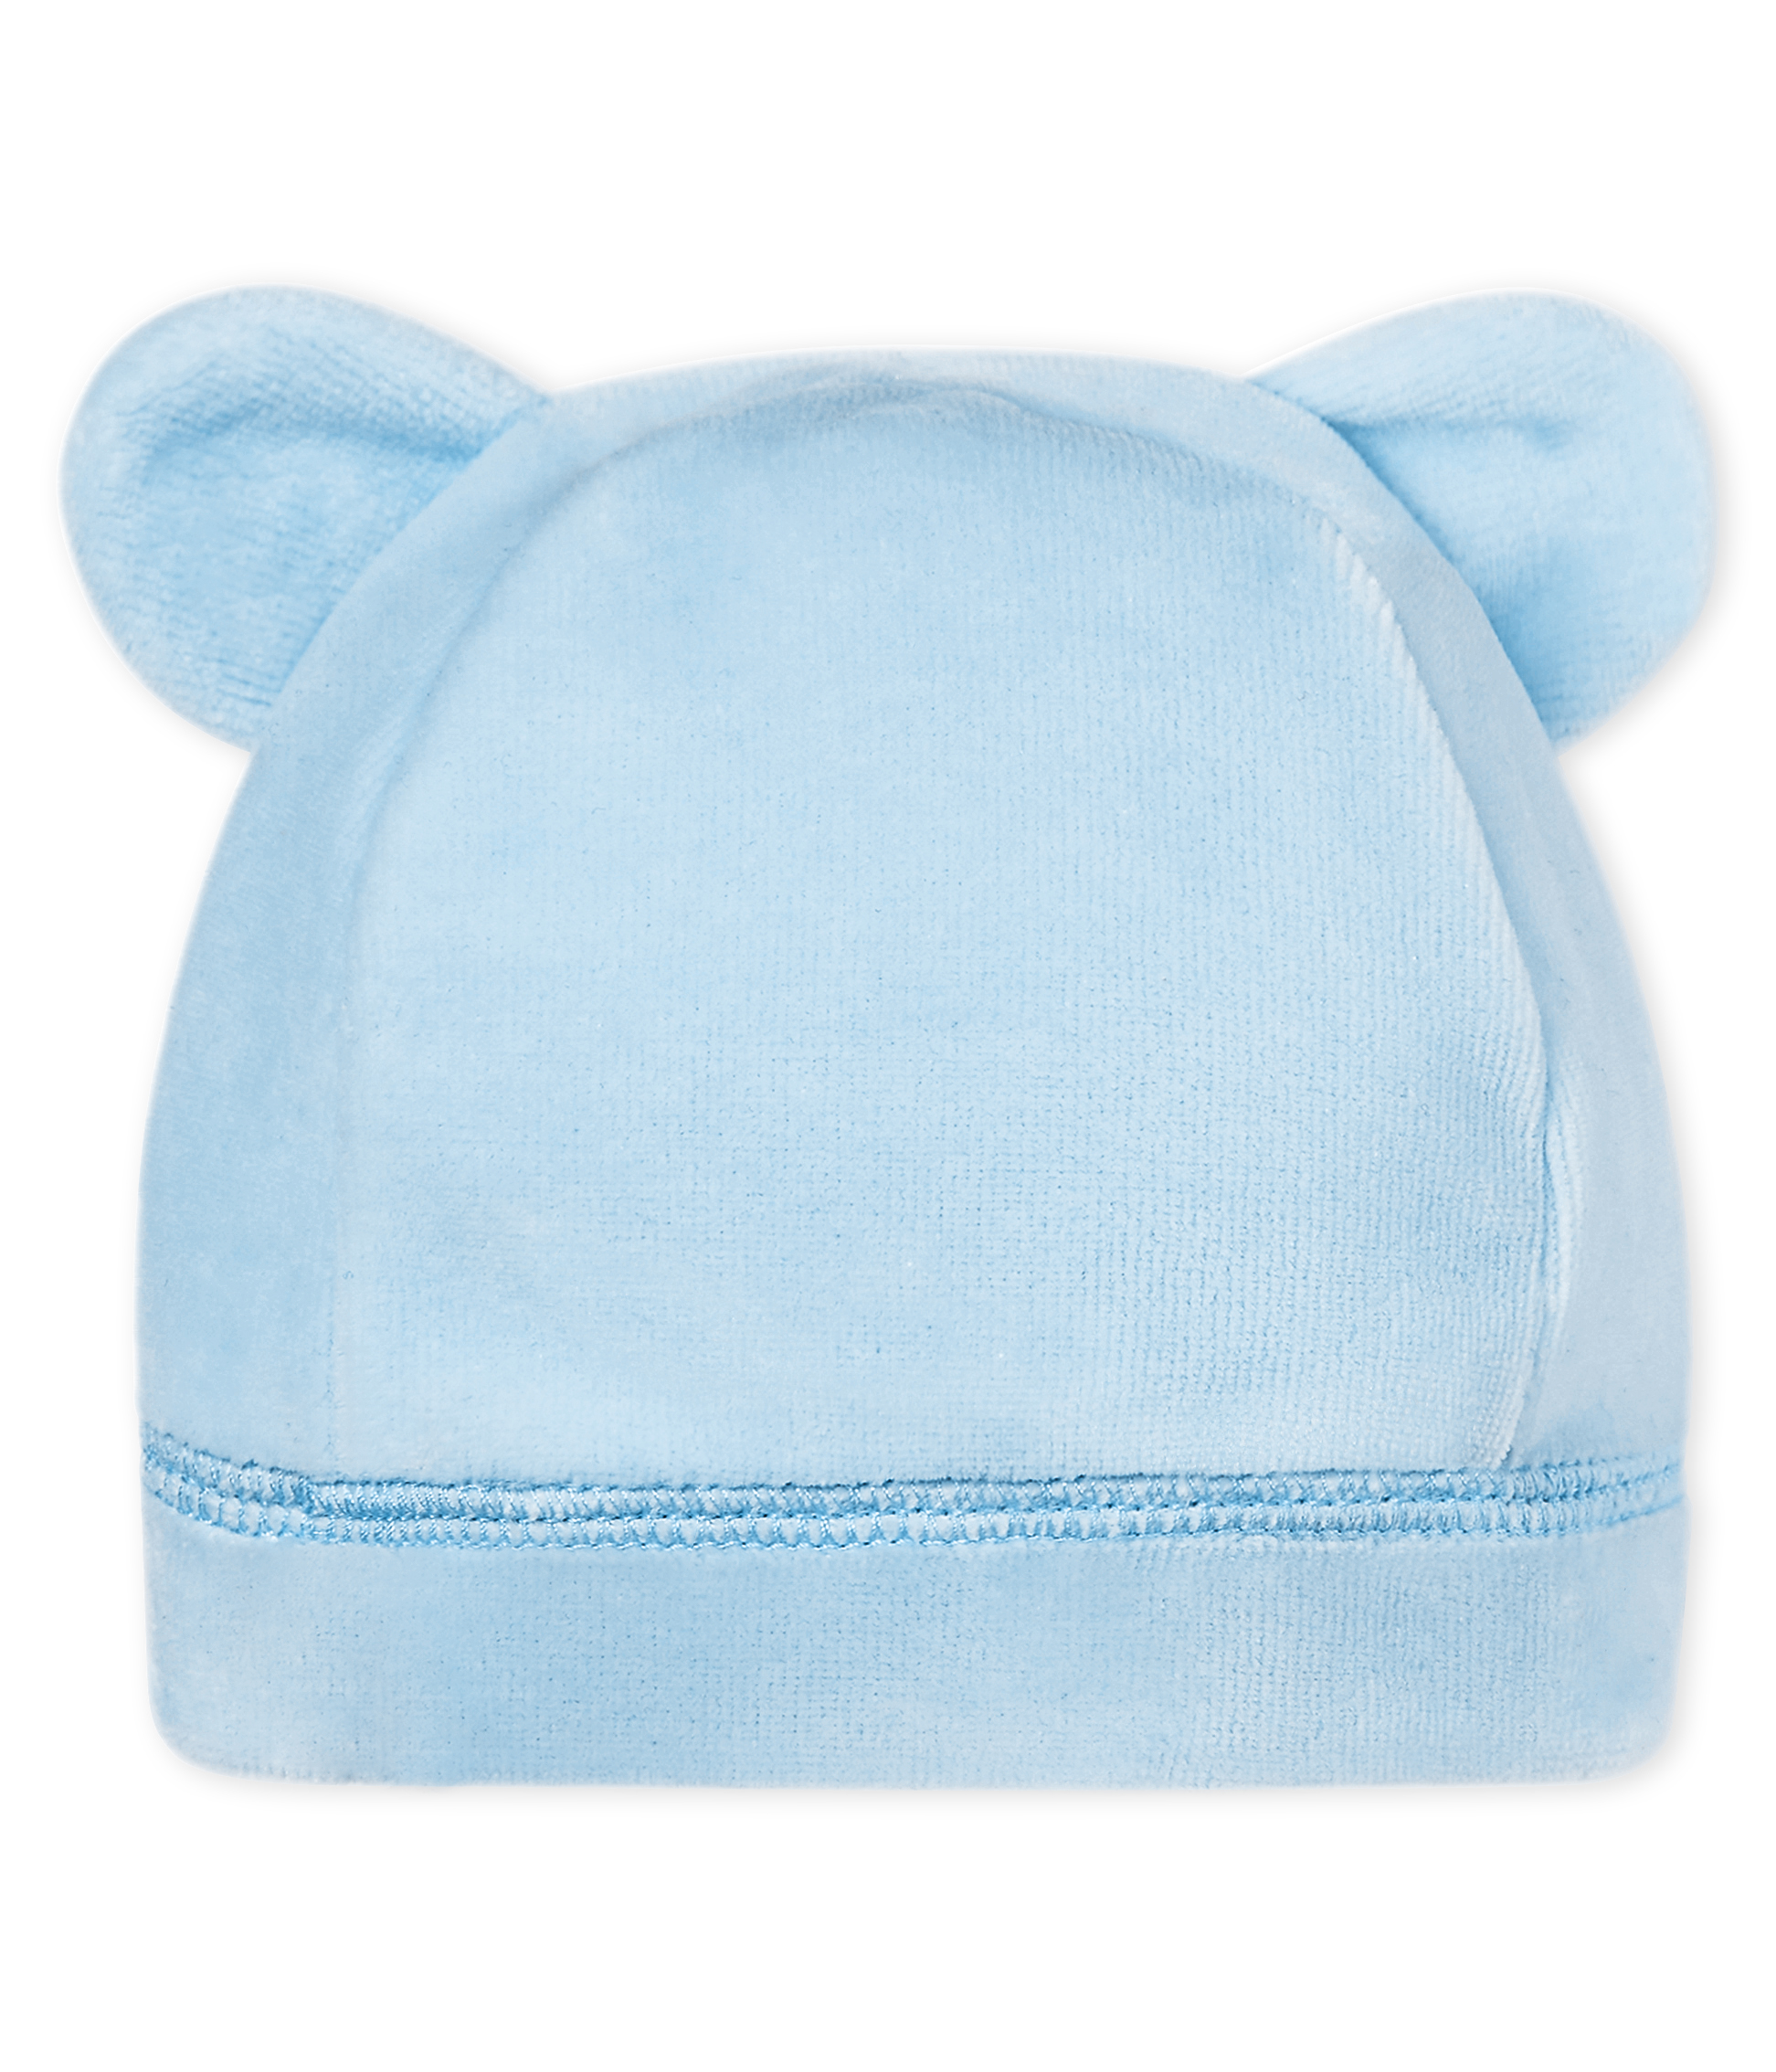 c227bf0485b Unisex newborn baby velour bonnet